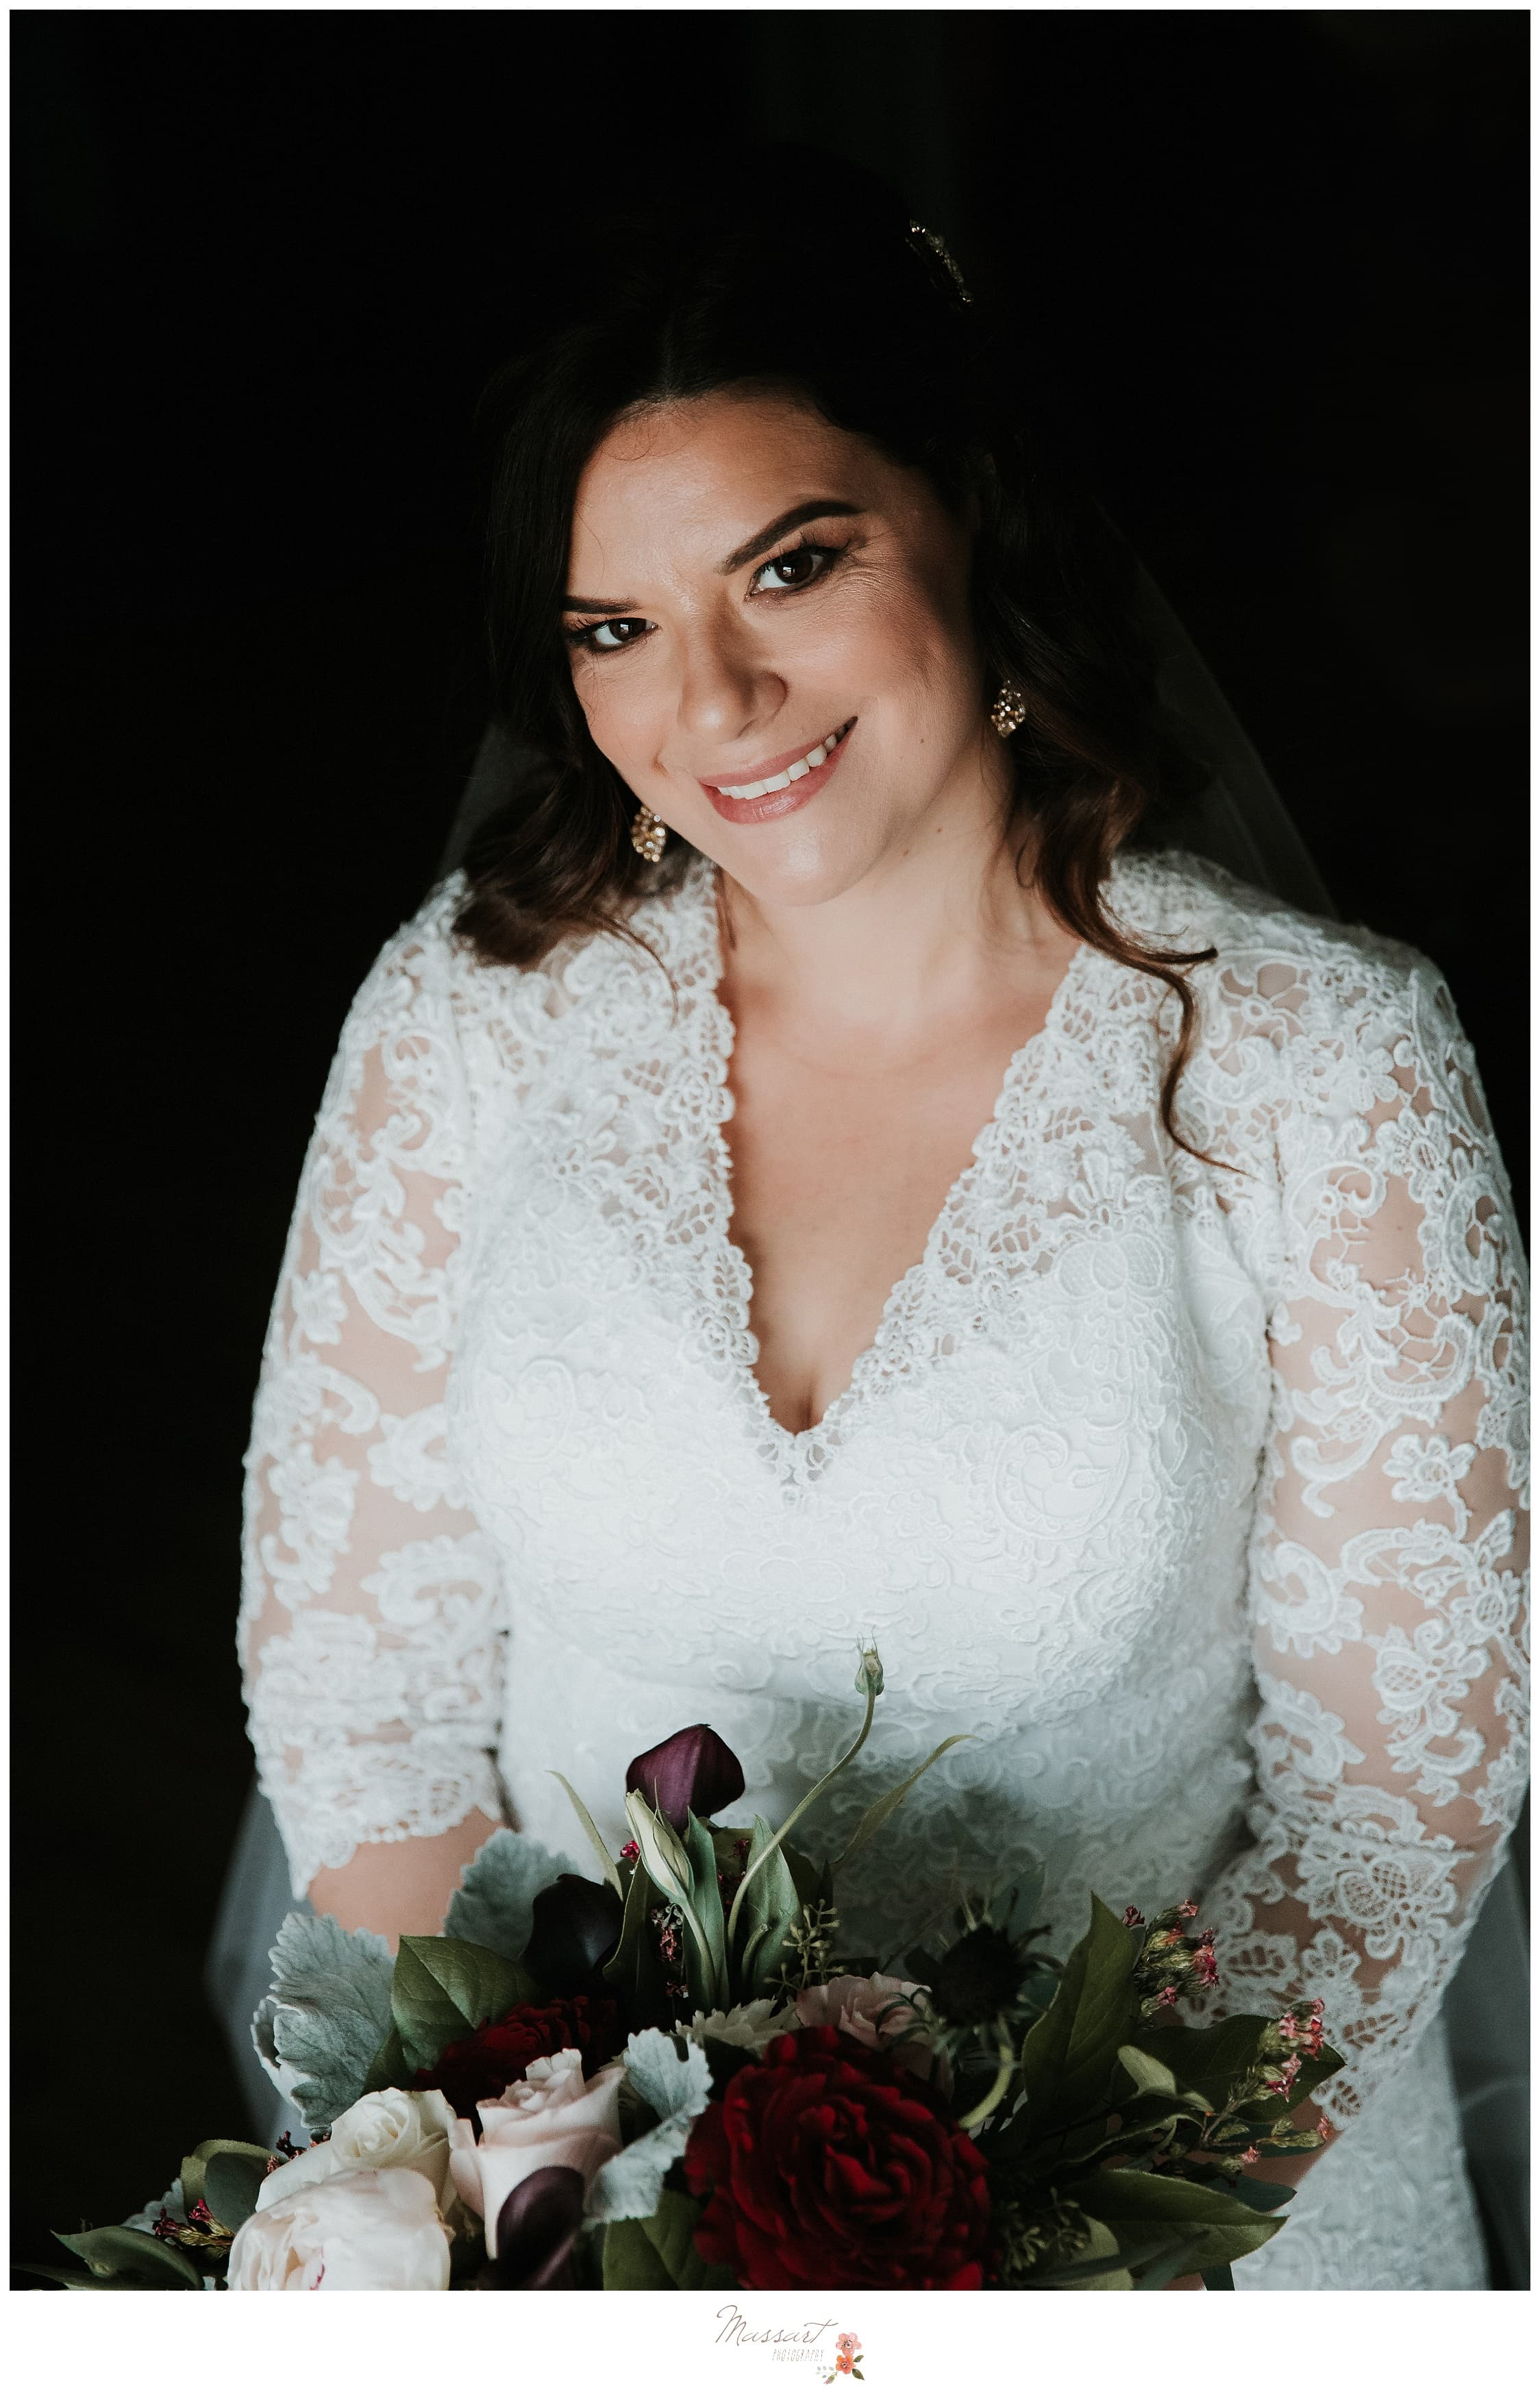 Portrait of the bride at the atlantic resort hotel in newport, RI by massart photographers